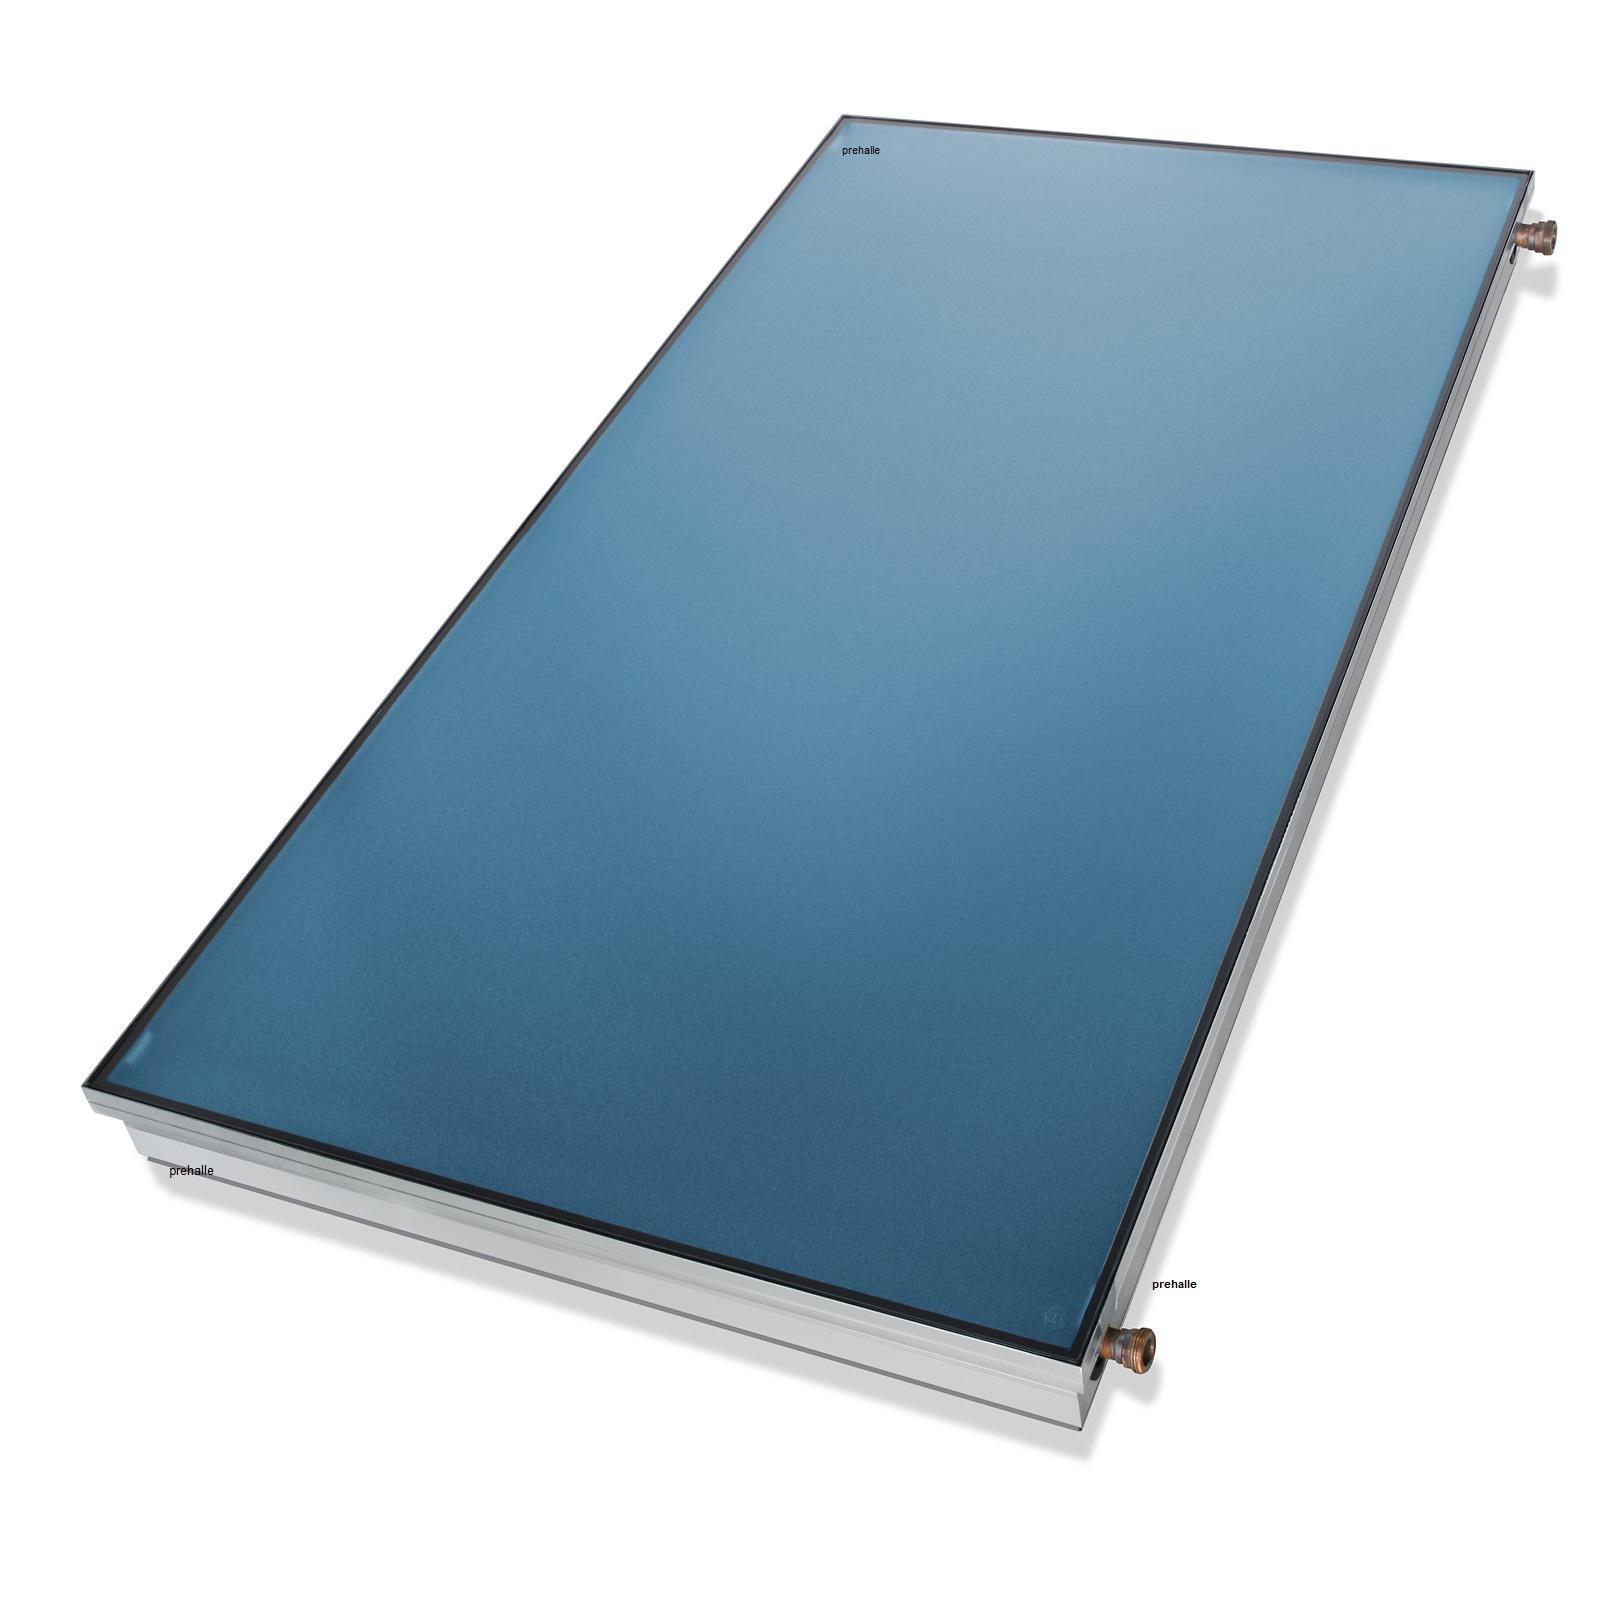 1a Top Flachkollektor 2 34m Kollektor Fur Solarthermie Solaranlage